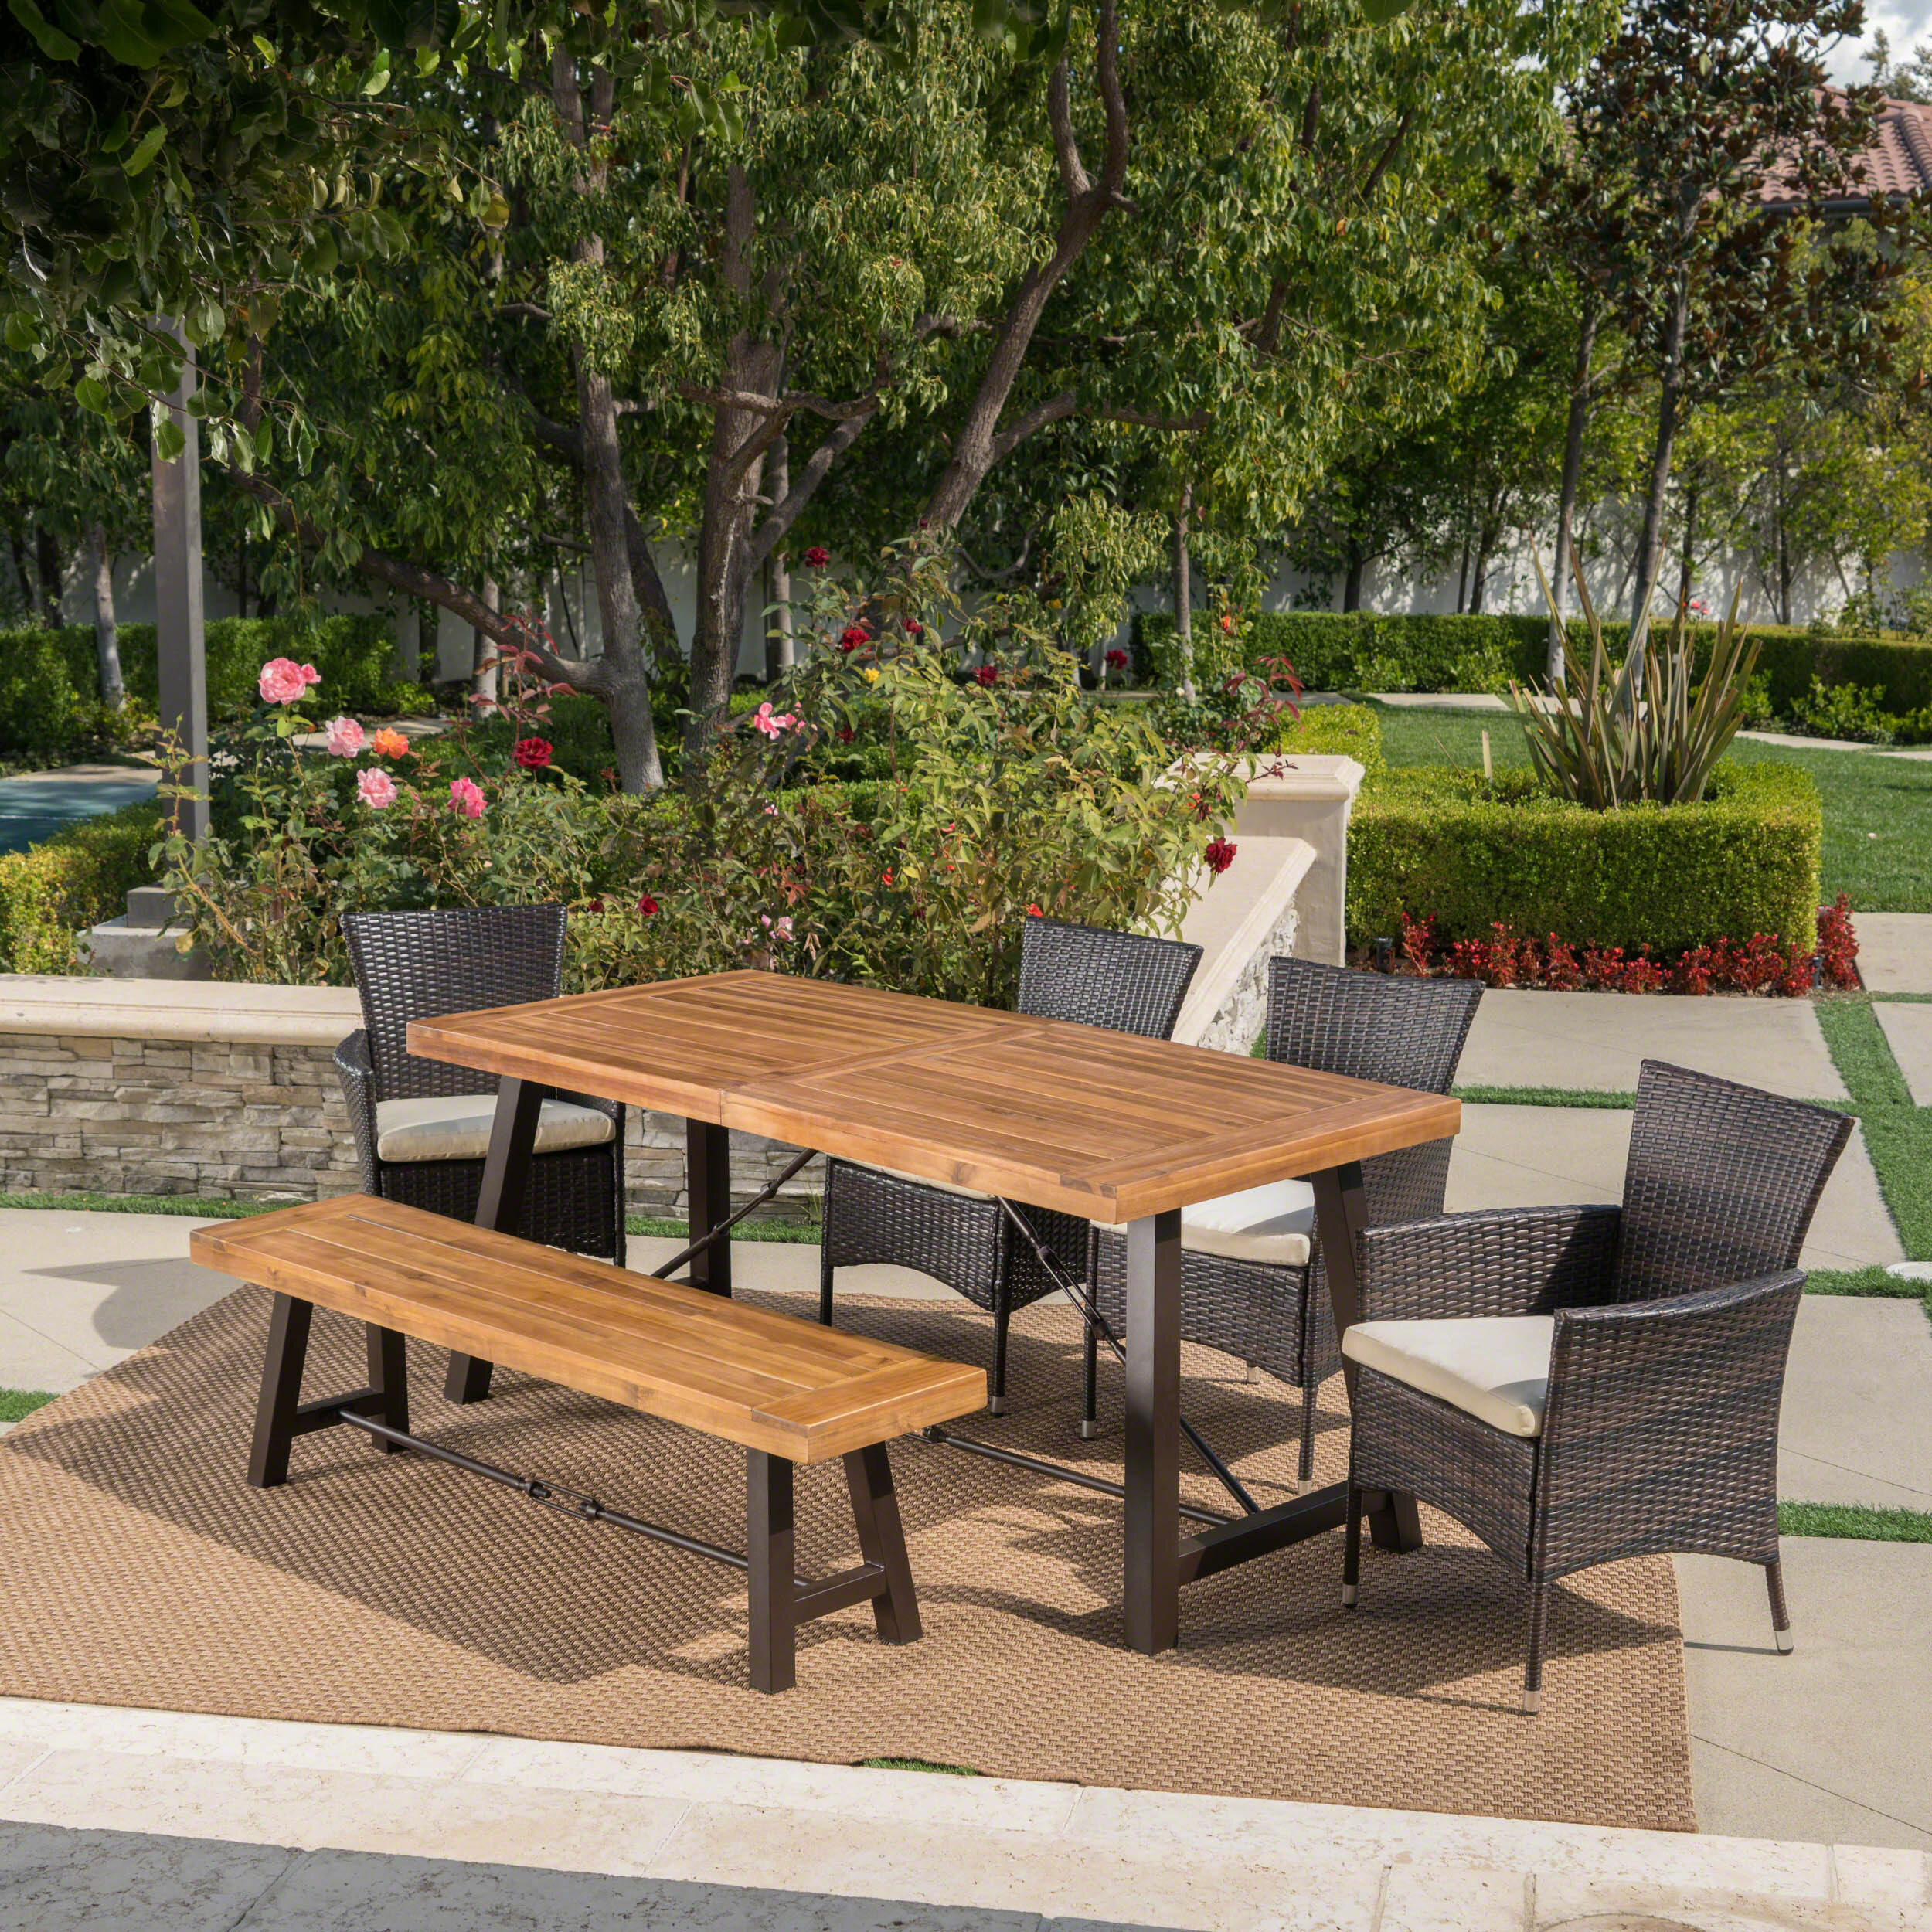 Antora Outdoor 6 Piece Dining Set